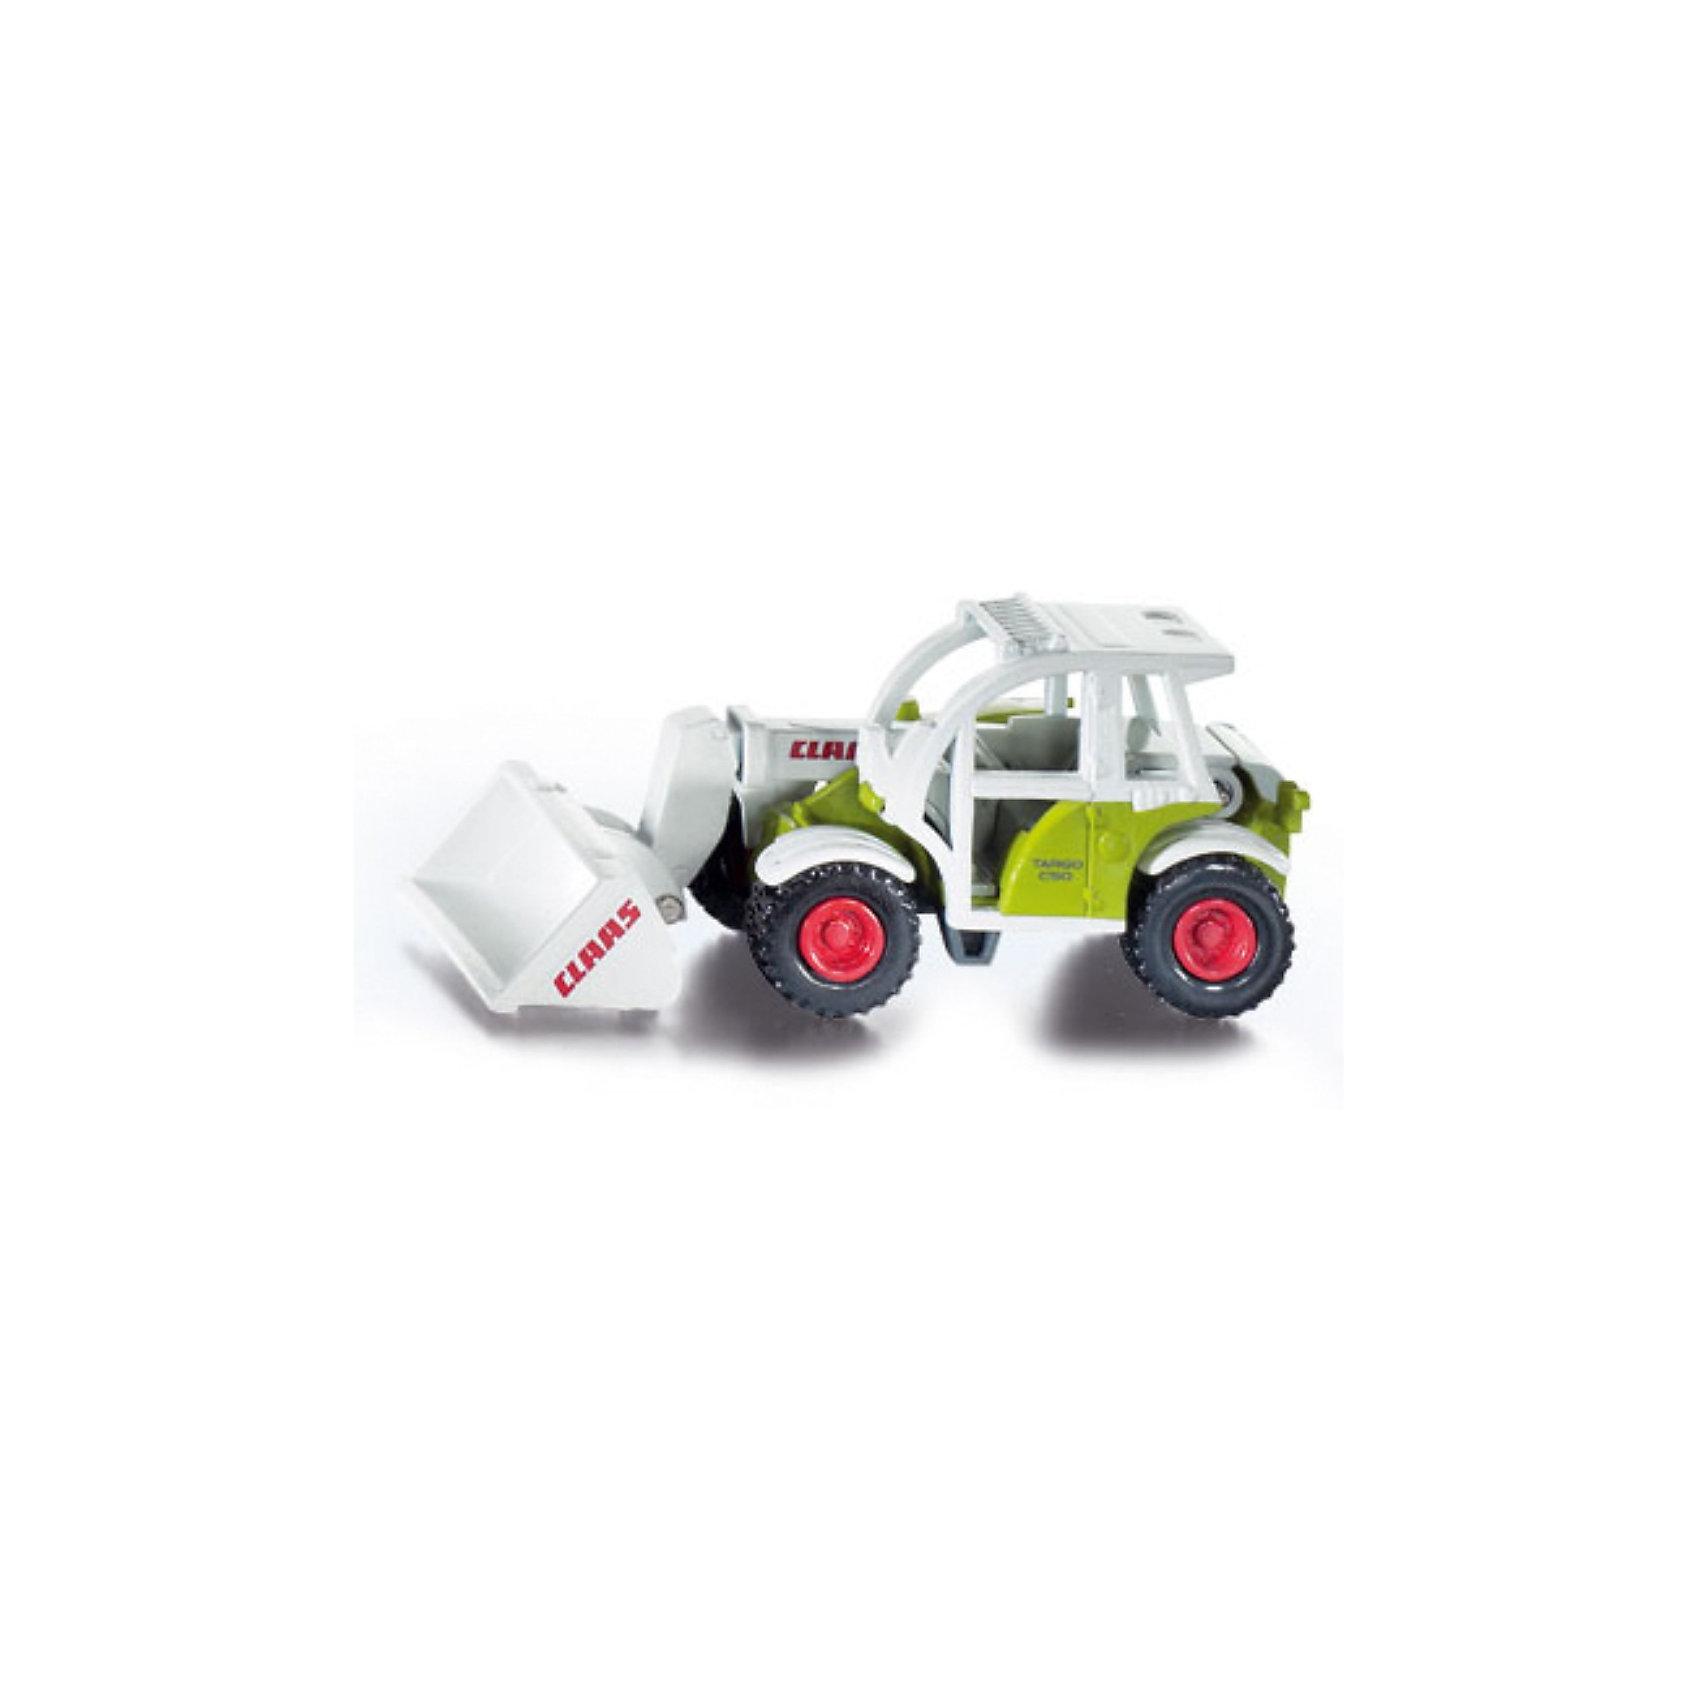 SIKU SIKU 1074 Погрузчик Claas Targo siku трактор claas с прицепом oehler